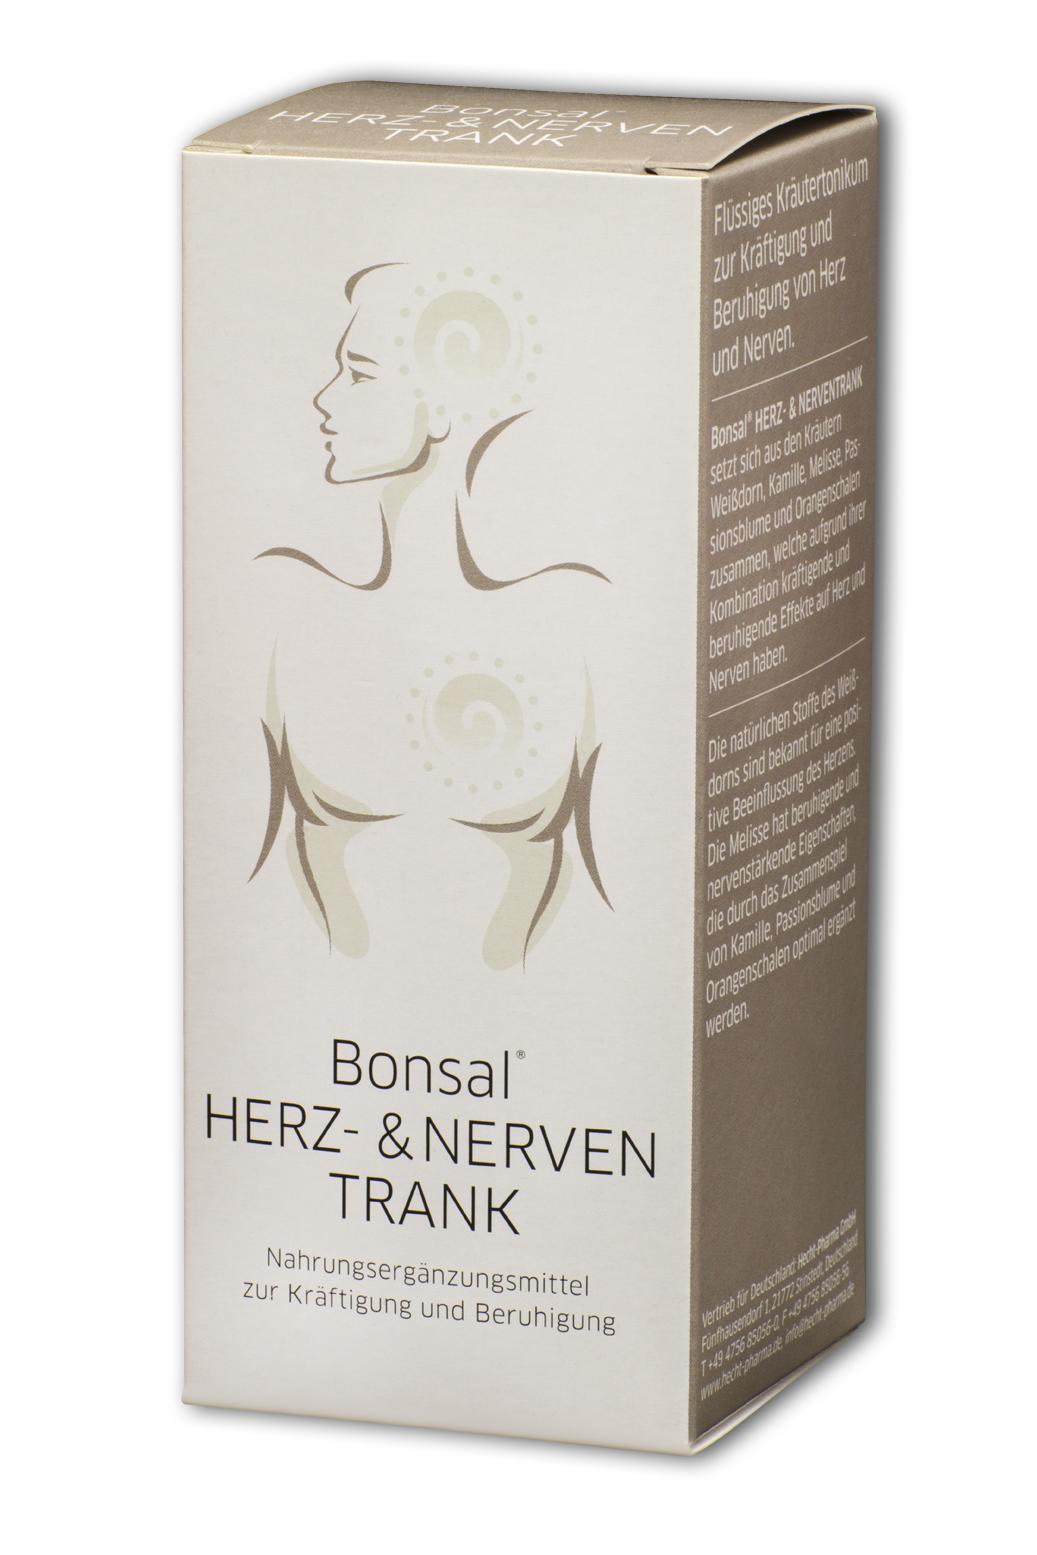 Bonsal® Herz-/Nerventrank